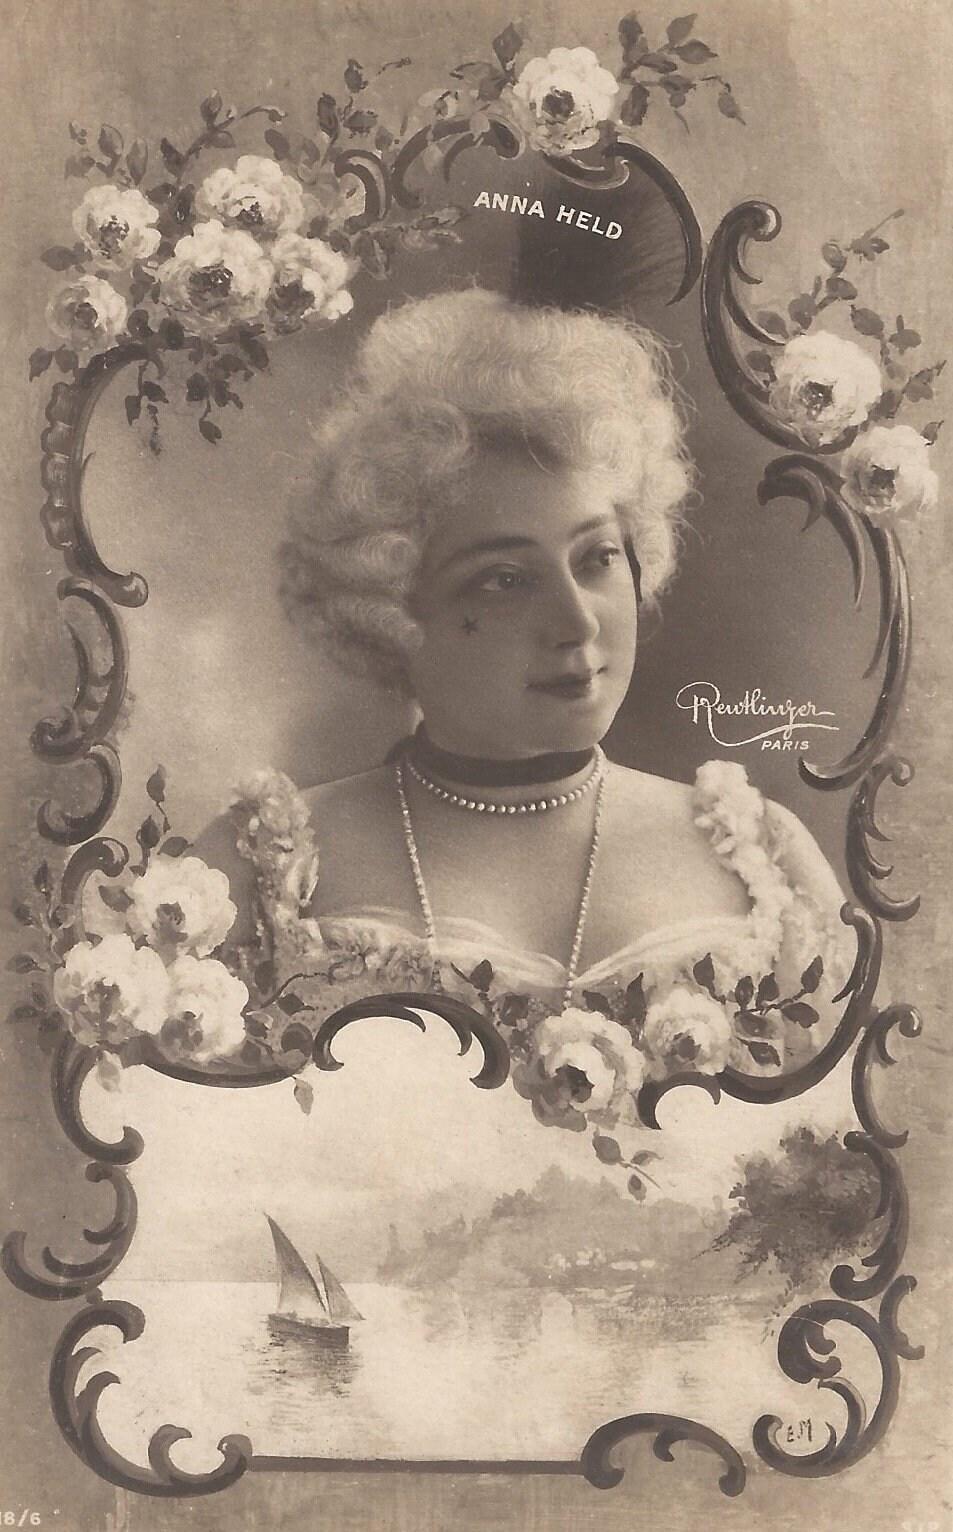 Famous Edwardian Actress Miss ANNA HELD Romantic Art Nouveau Fantasy as  Baroque ROCOCO French Lady Antique Reutlinger Postcard    Year 1904